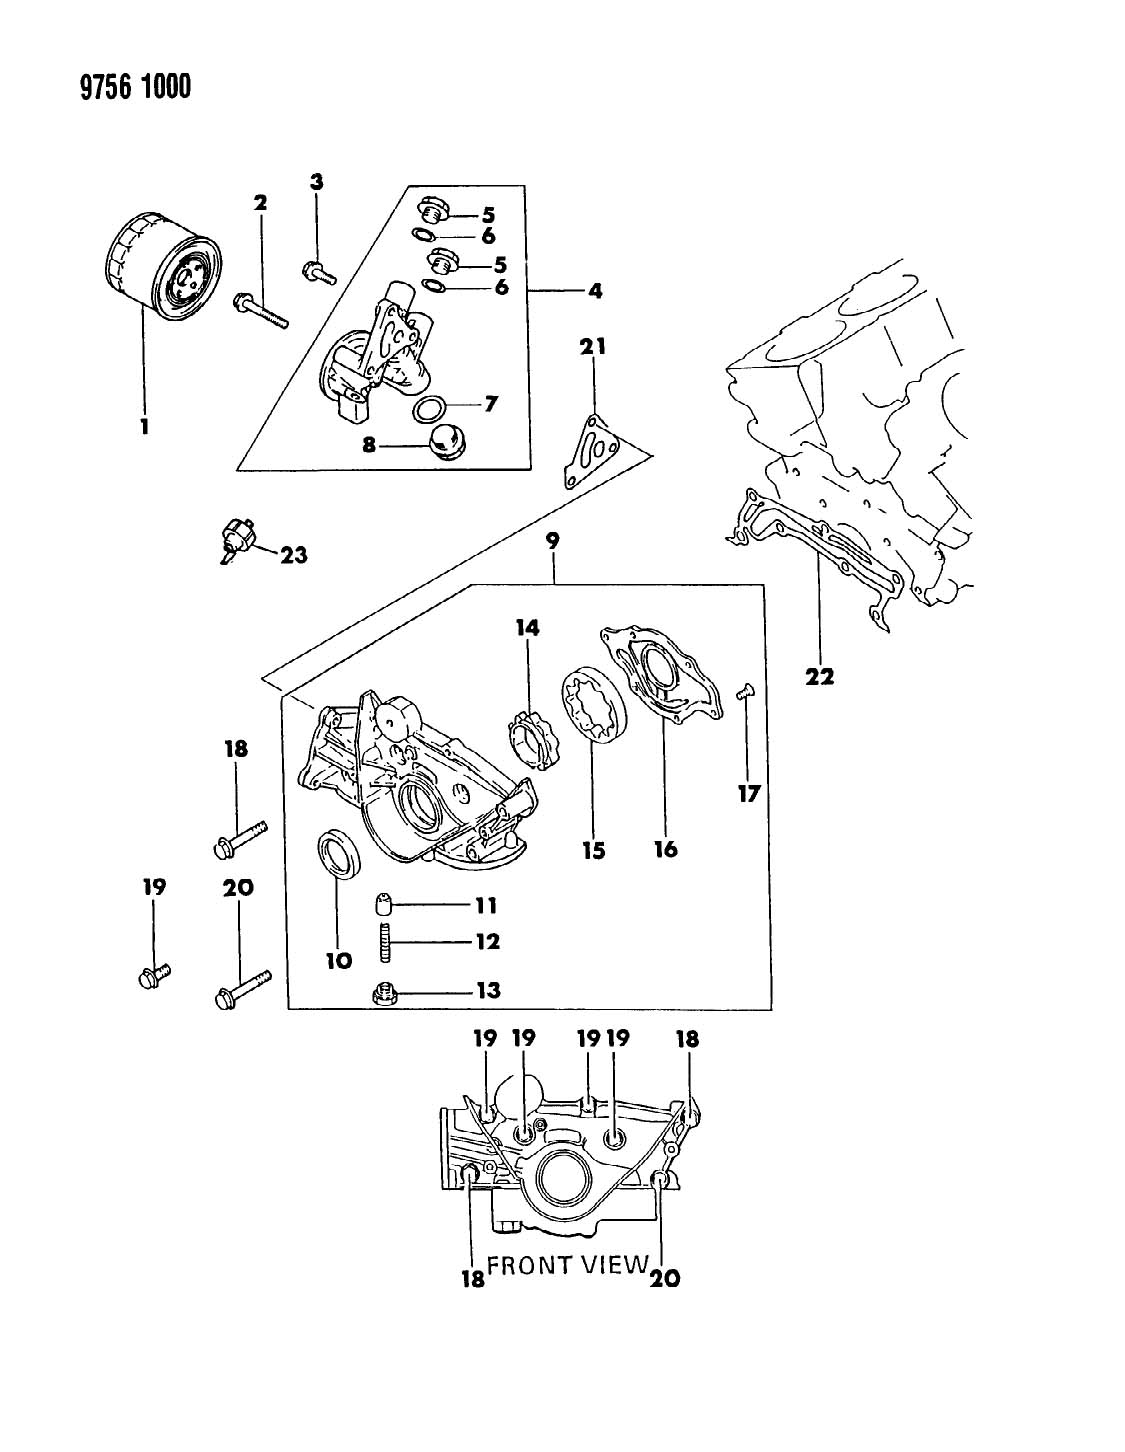 1989 Dodge OIL PUMP & OIL FILTER RAIDER 3.0 L ENGINE